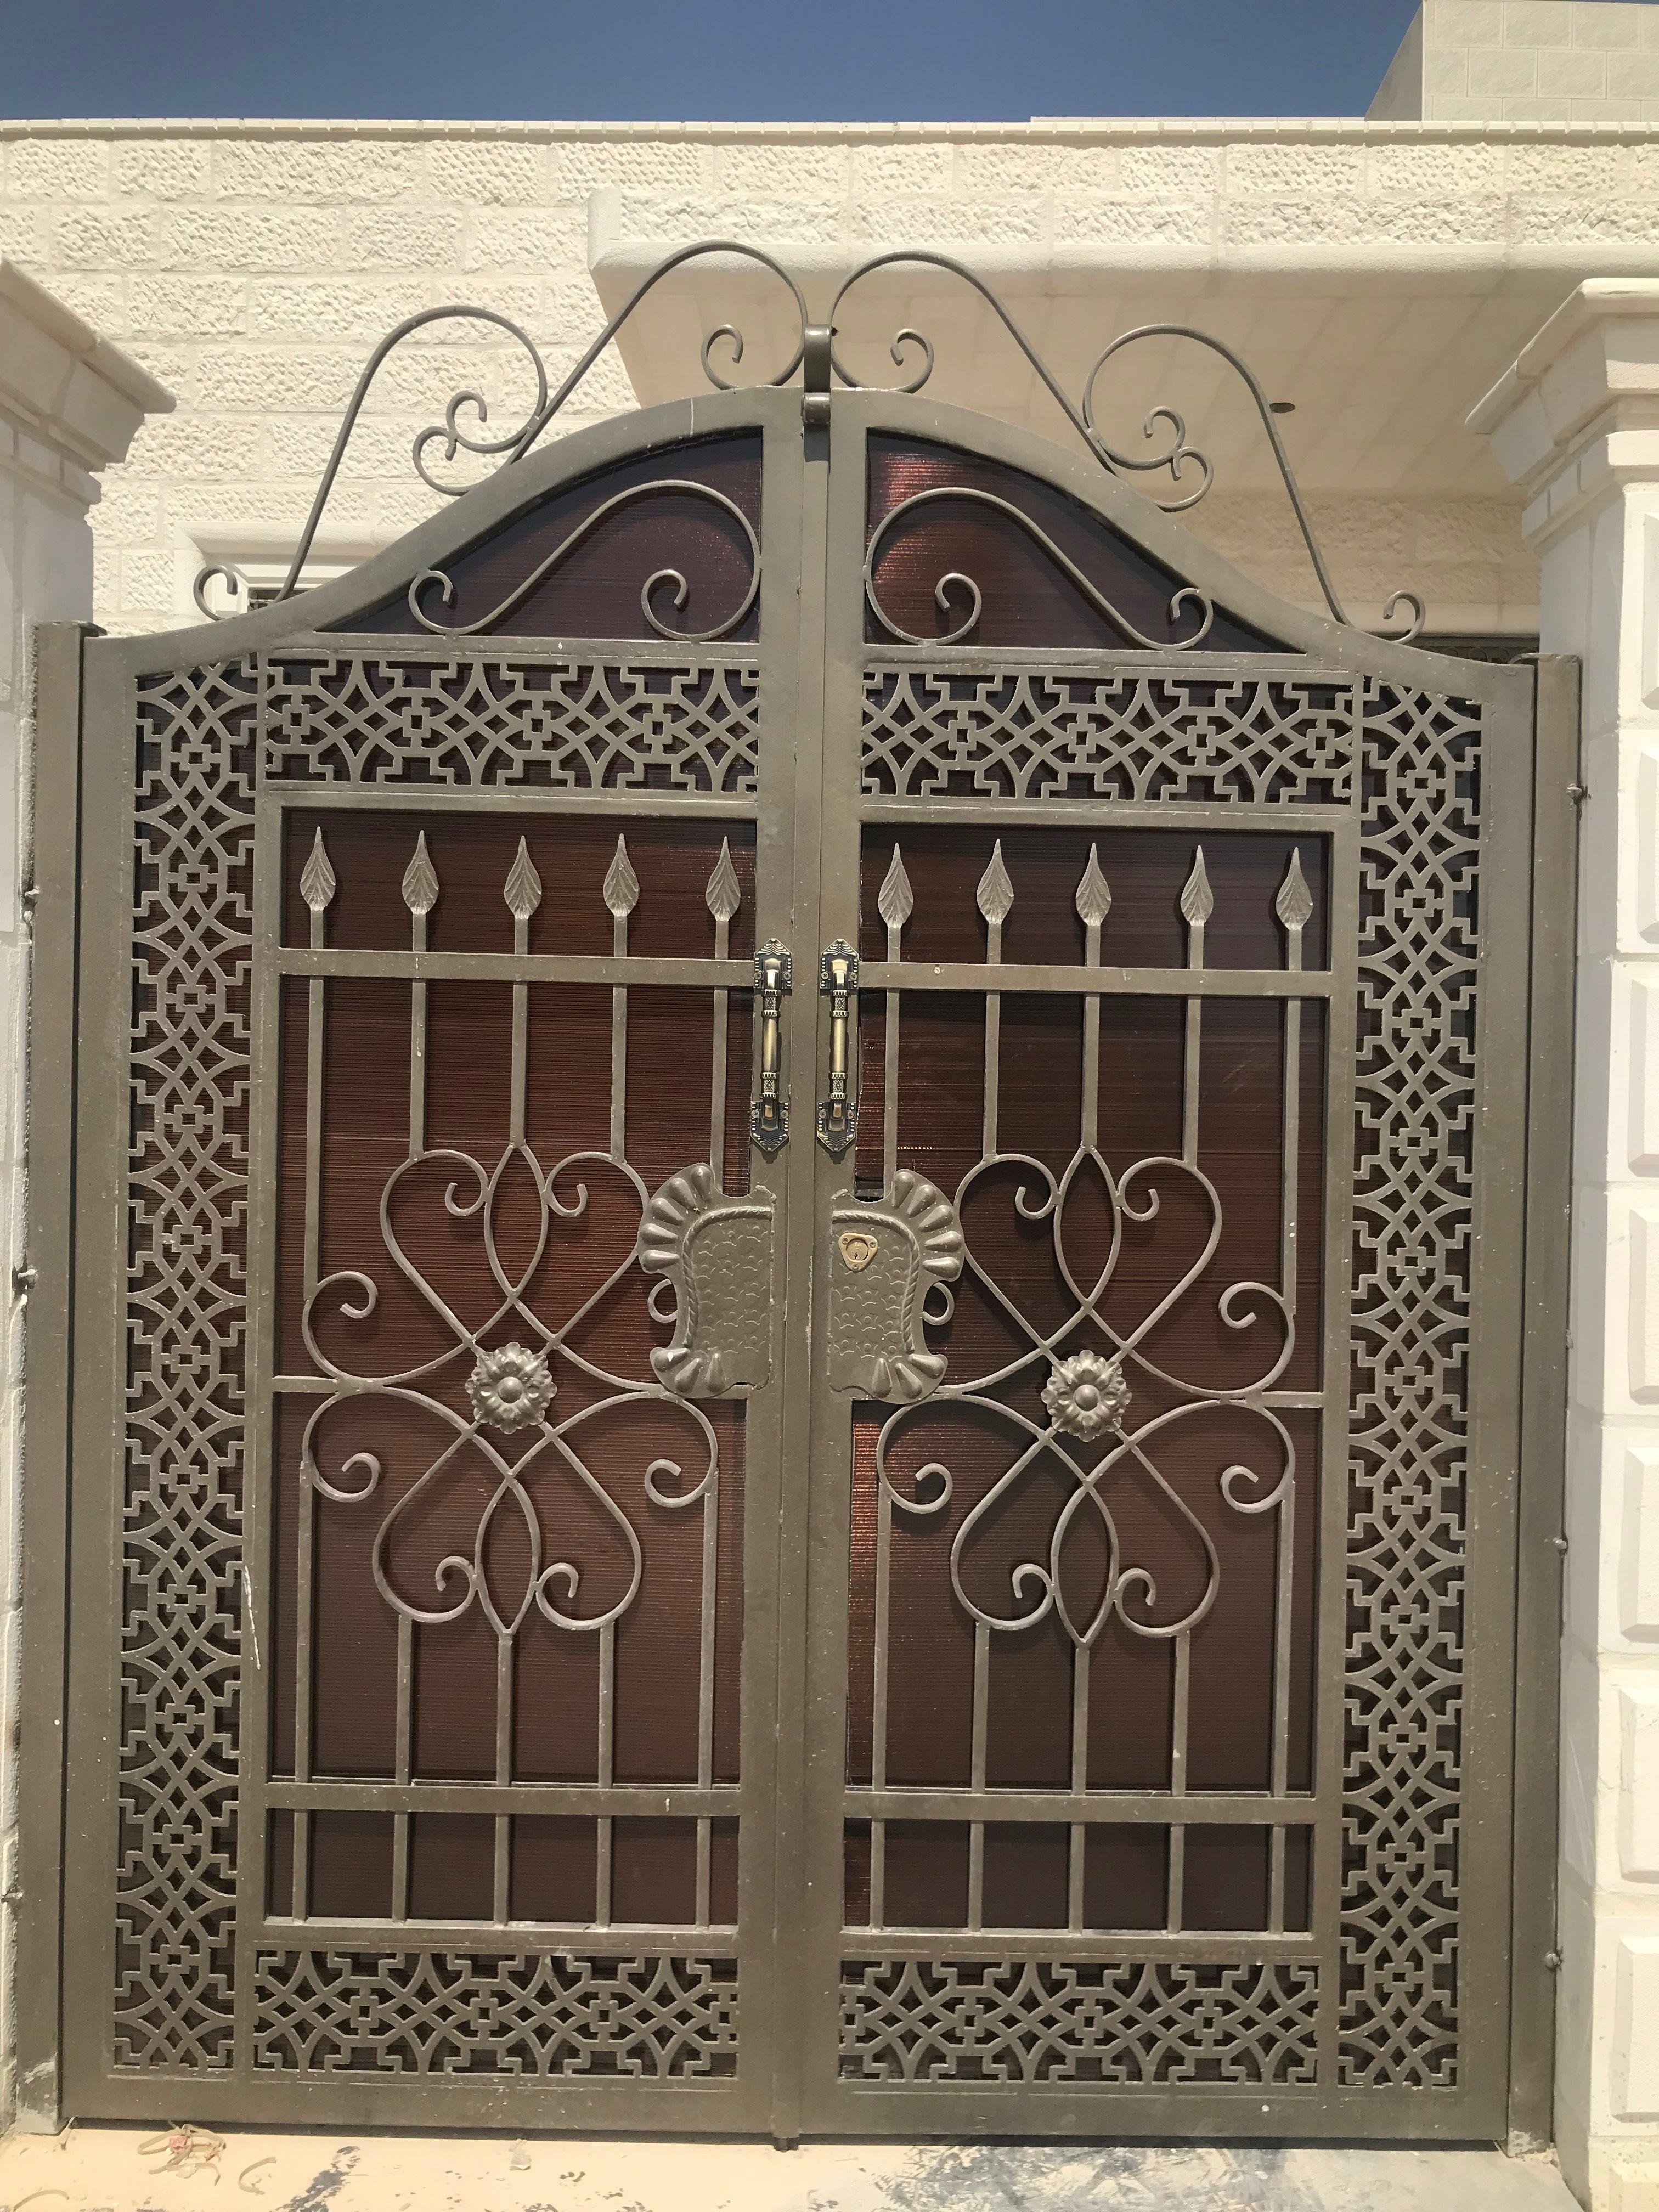 Pin By Tahir Khan On اعمال الحديد محدده يالو Steel Gate Design Gate Design Metal Doors Design